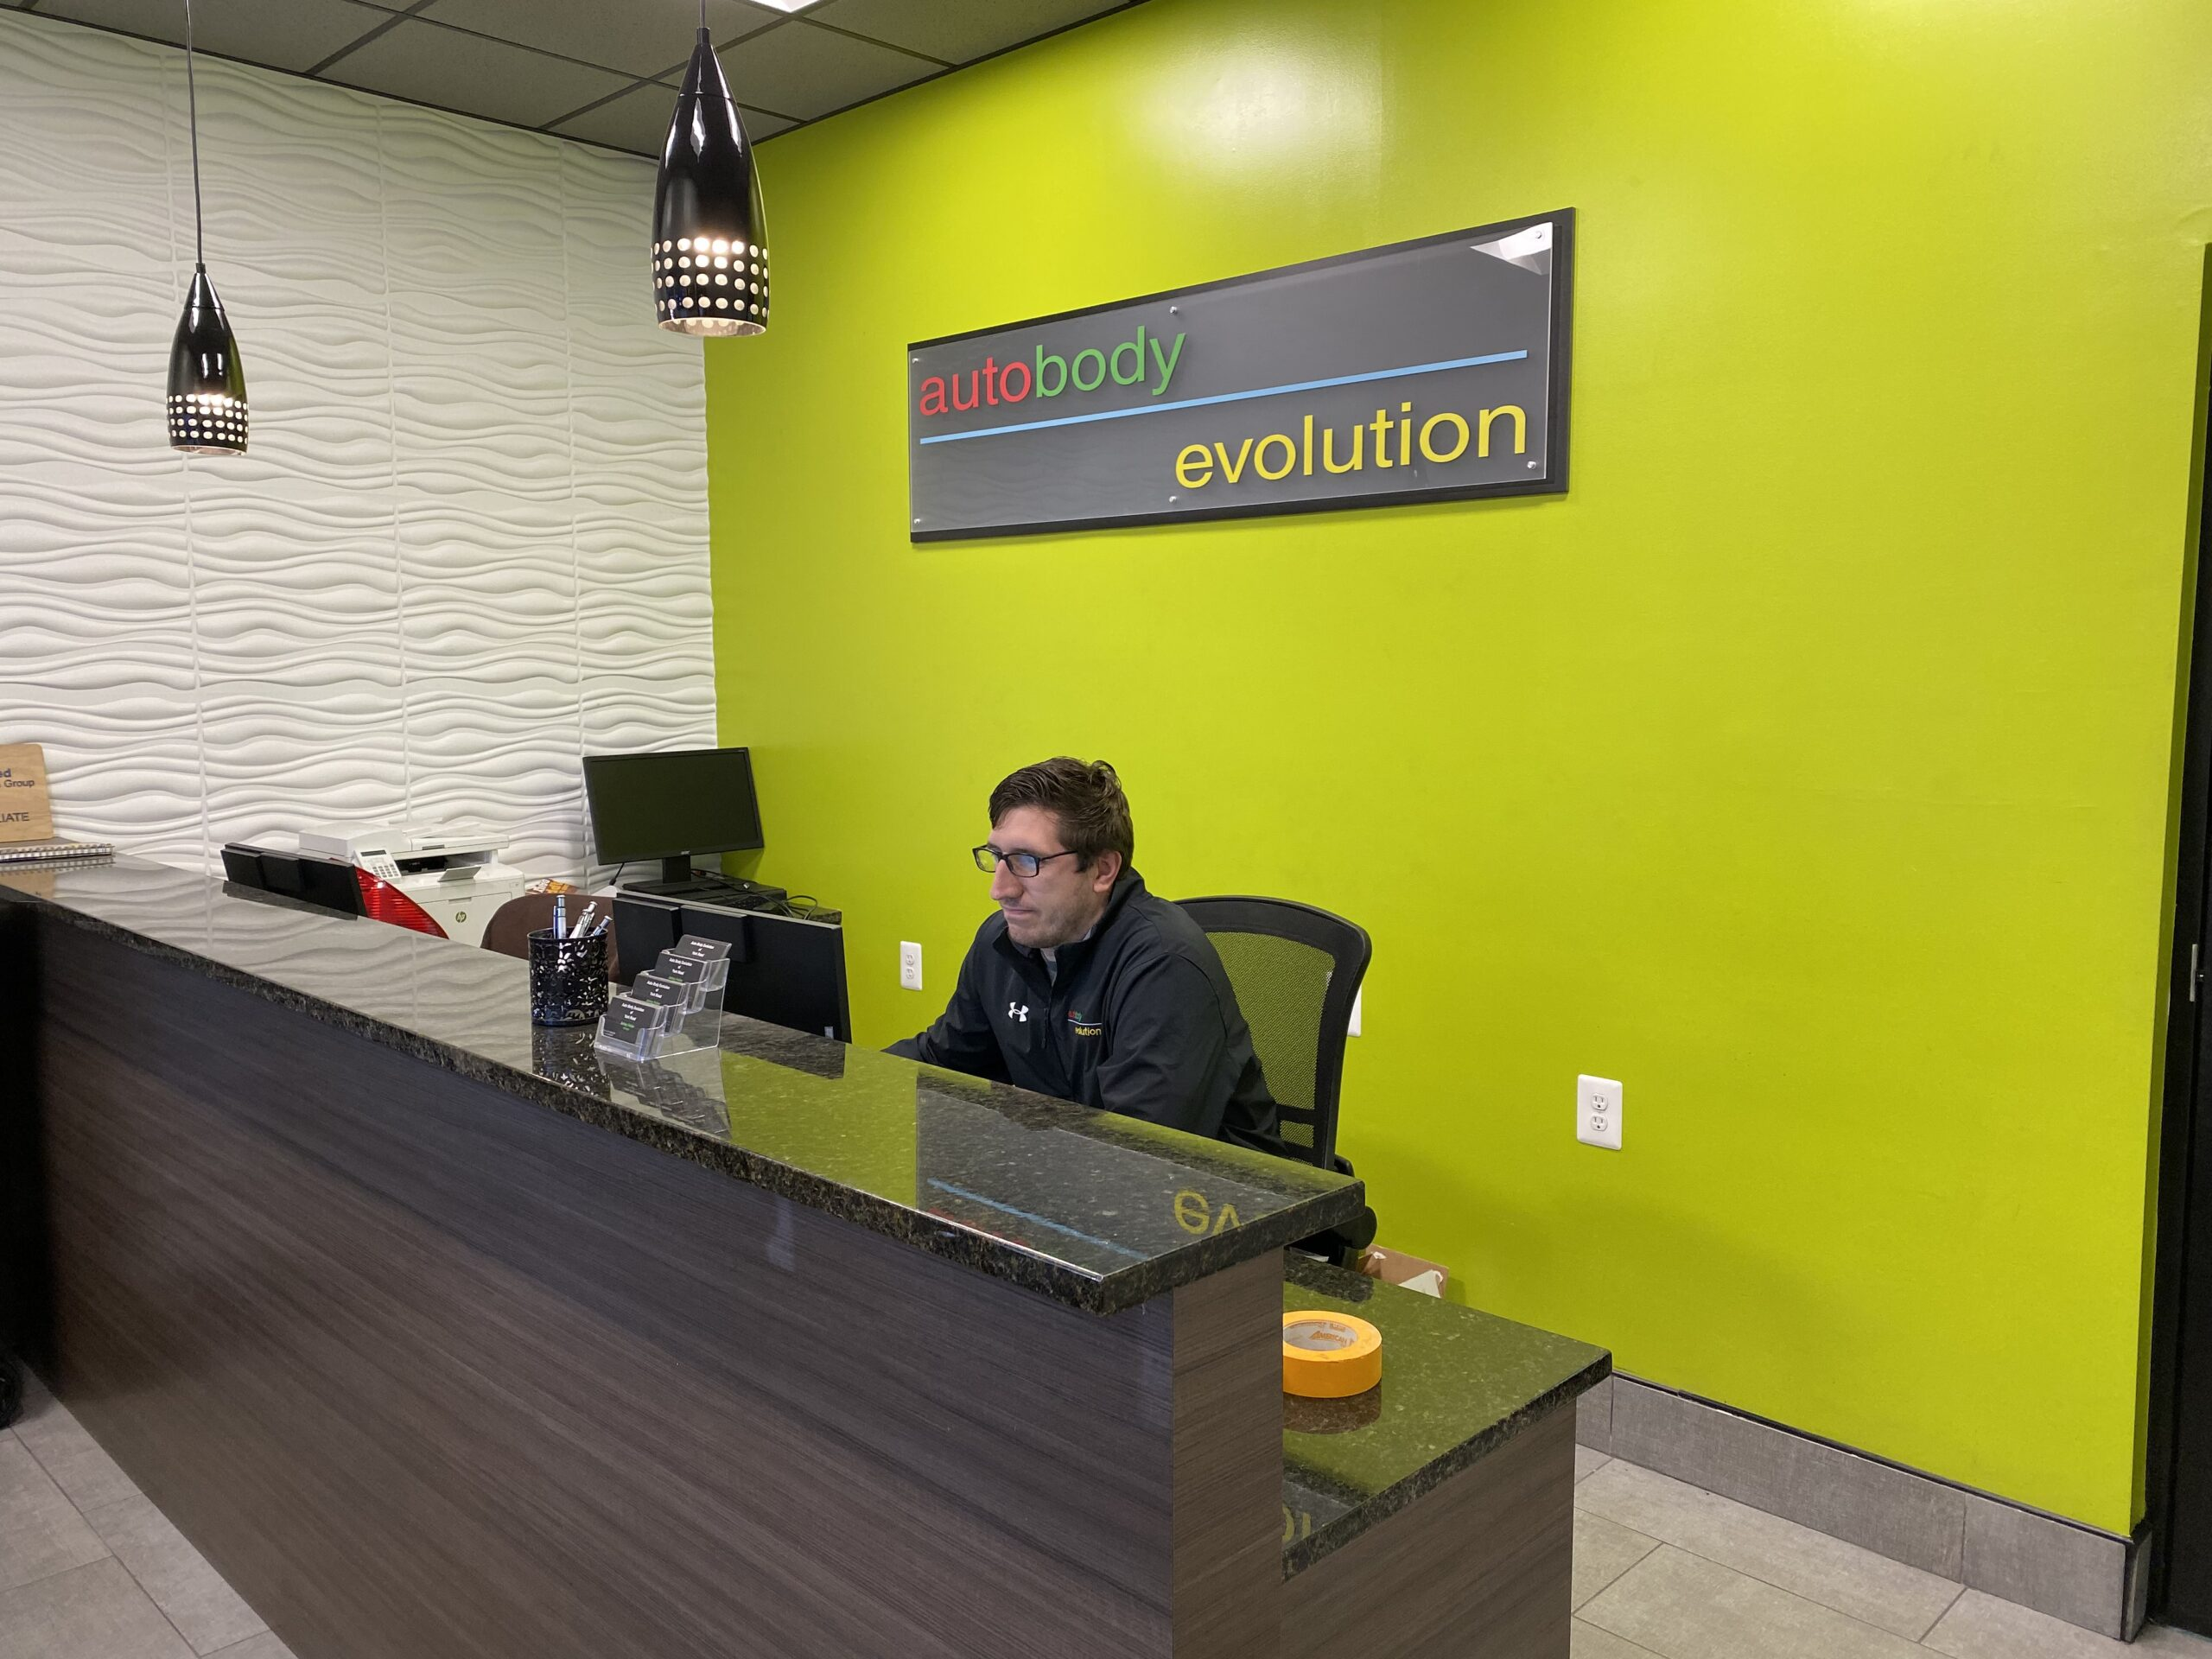 Autobody Evolution York Road Manager